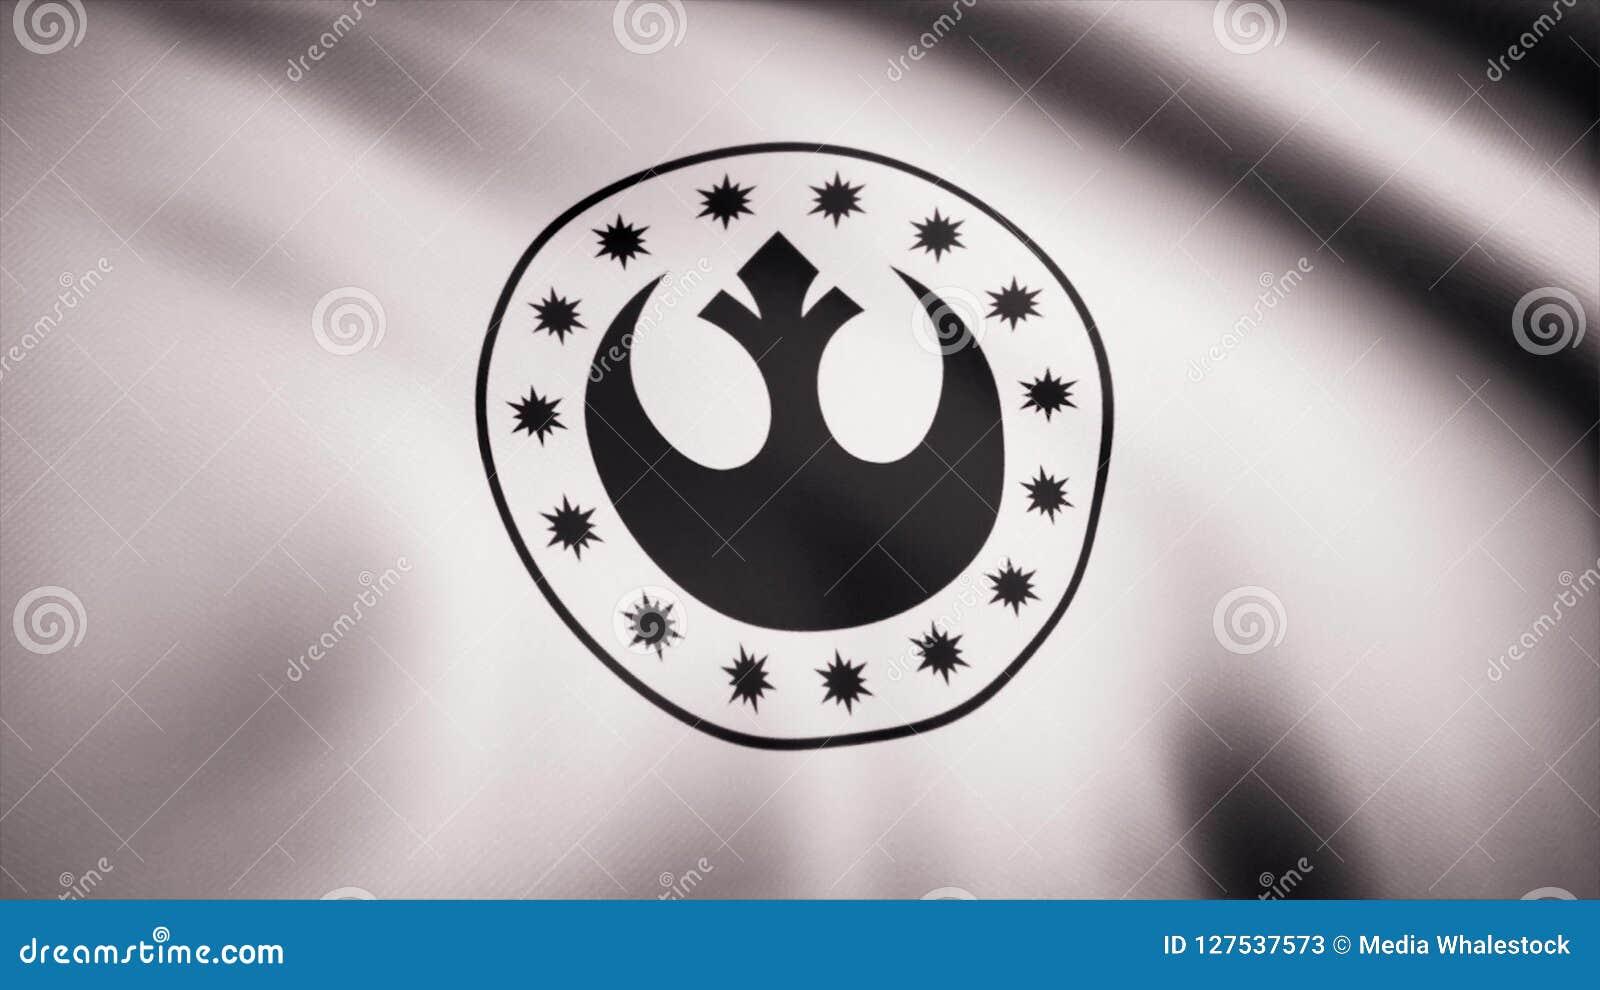 Star Wars New Republic Symbol On Flag The Star Wars Theme